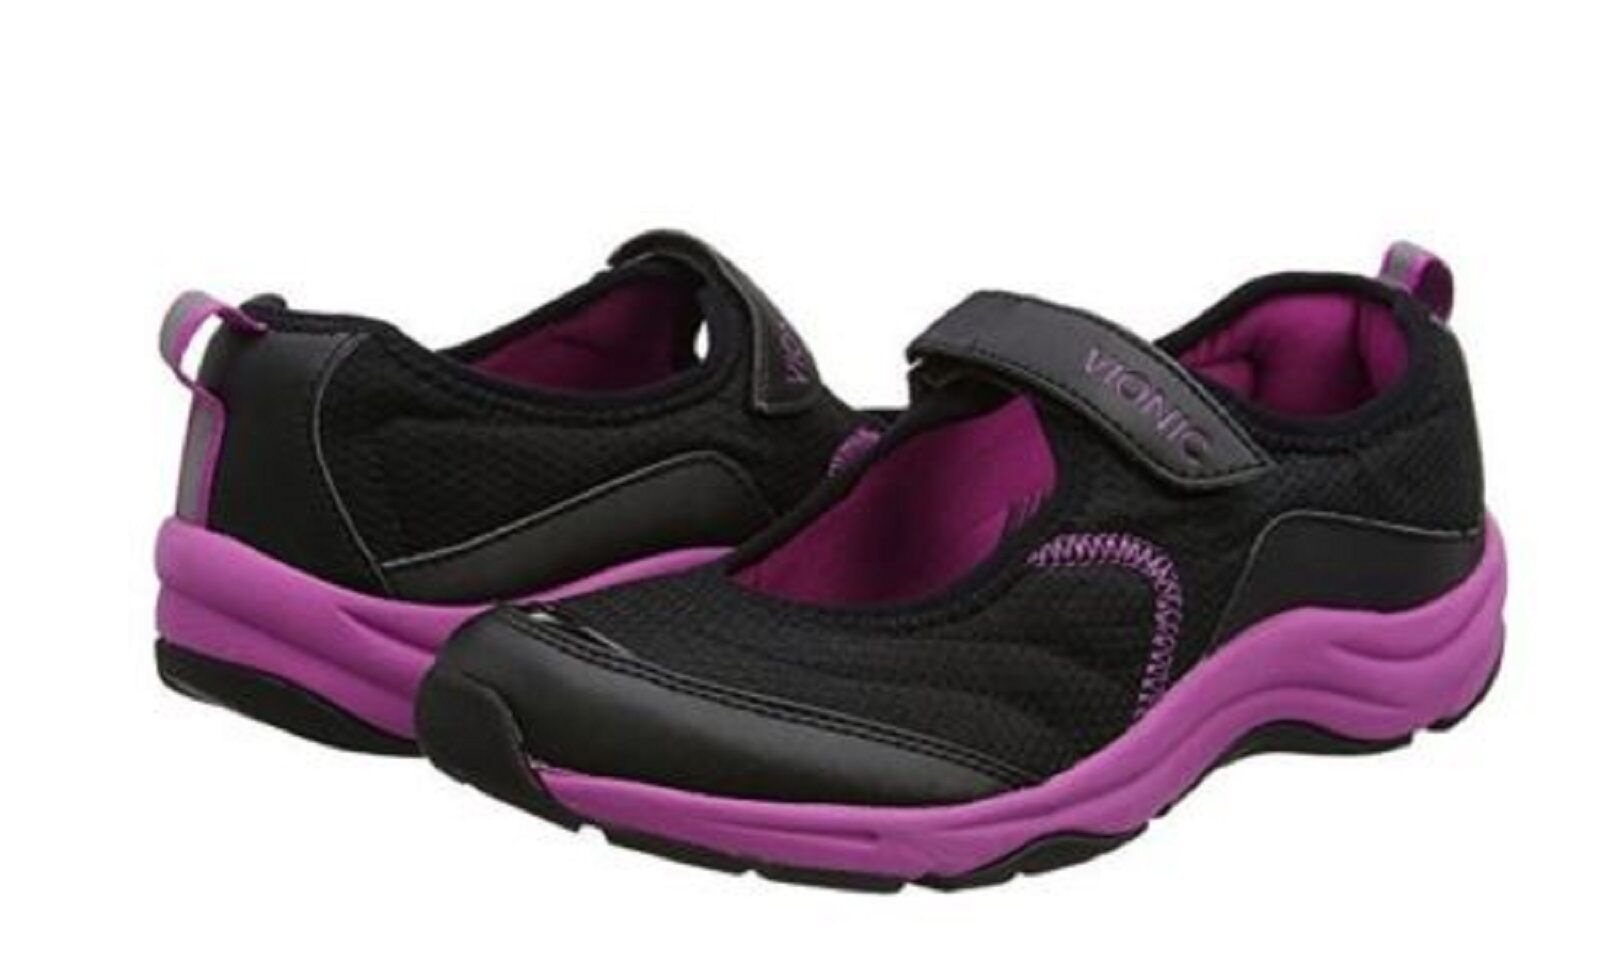 VIONIC Orthaheel 'Action Sunset' Ladies  Mary Jane shoes Black  Sz.5 M   NIB